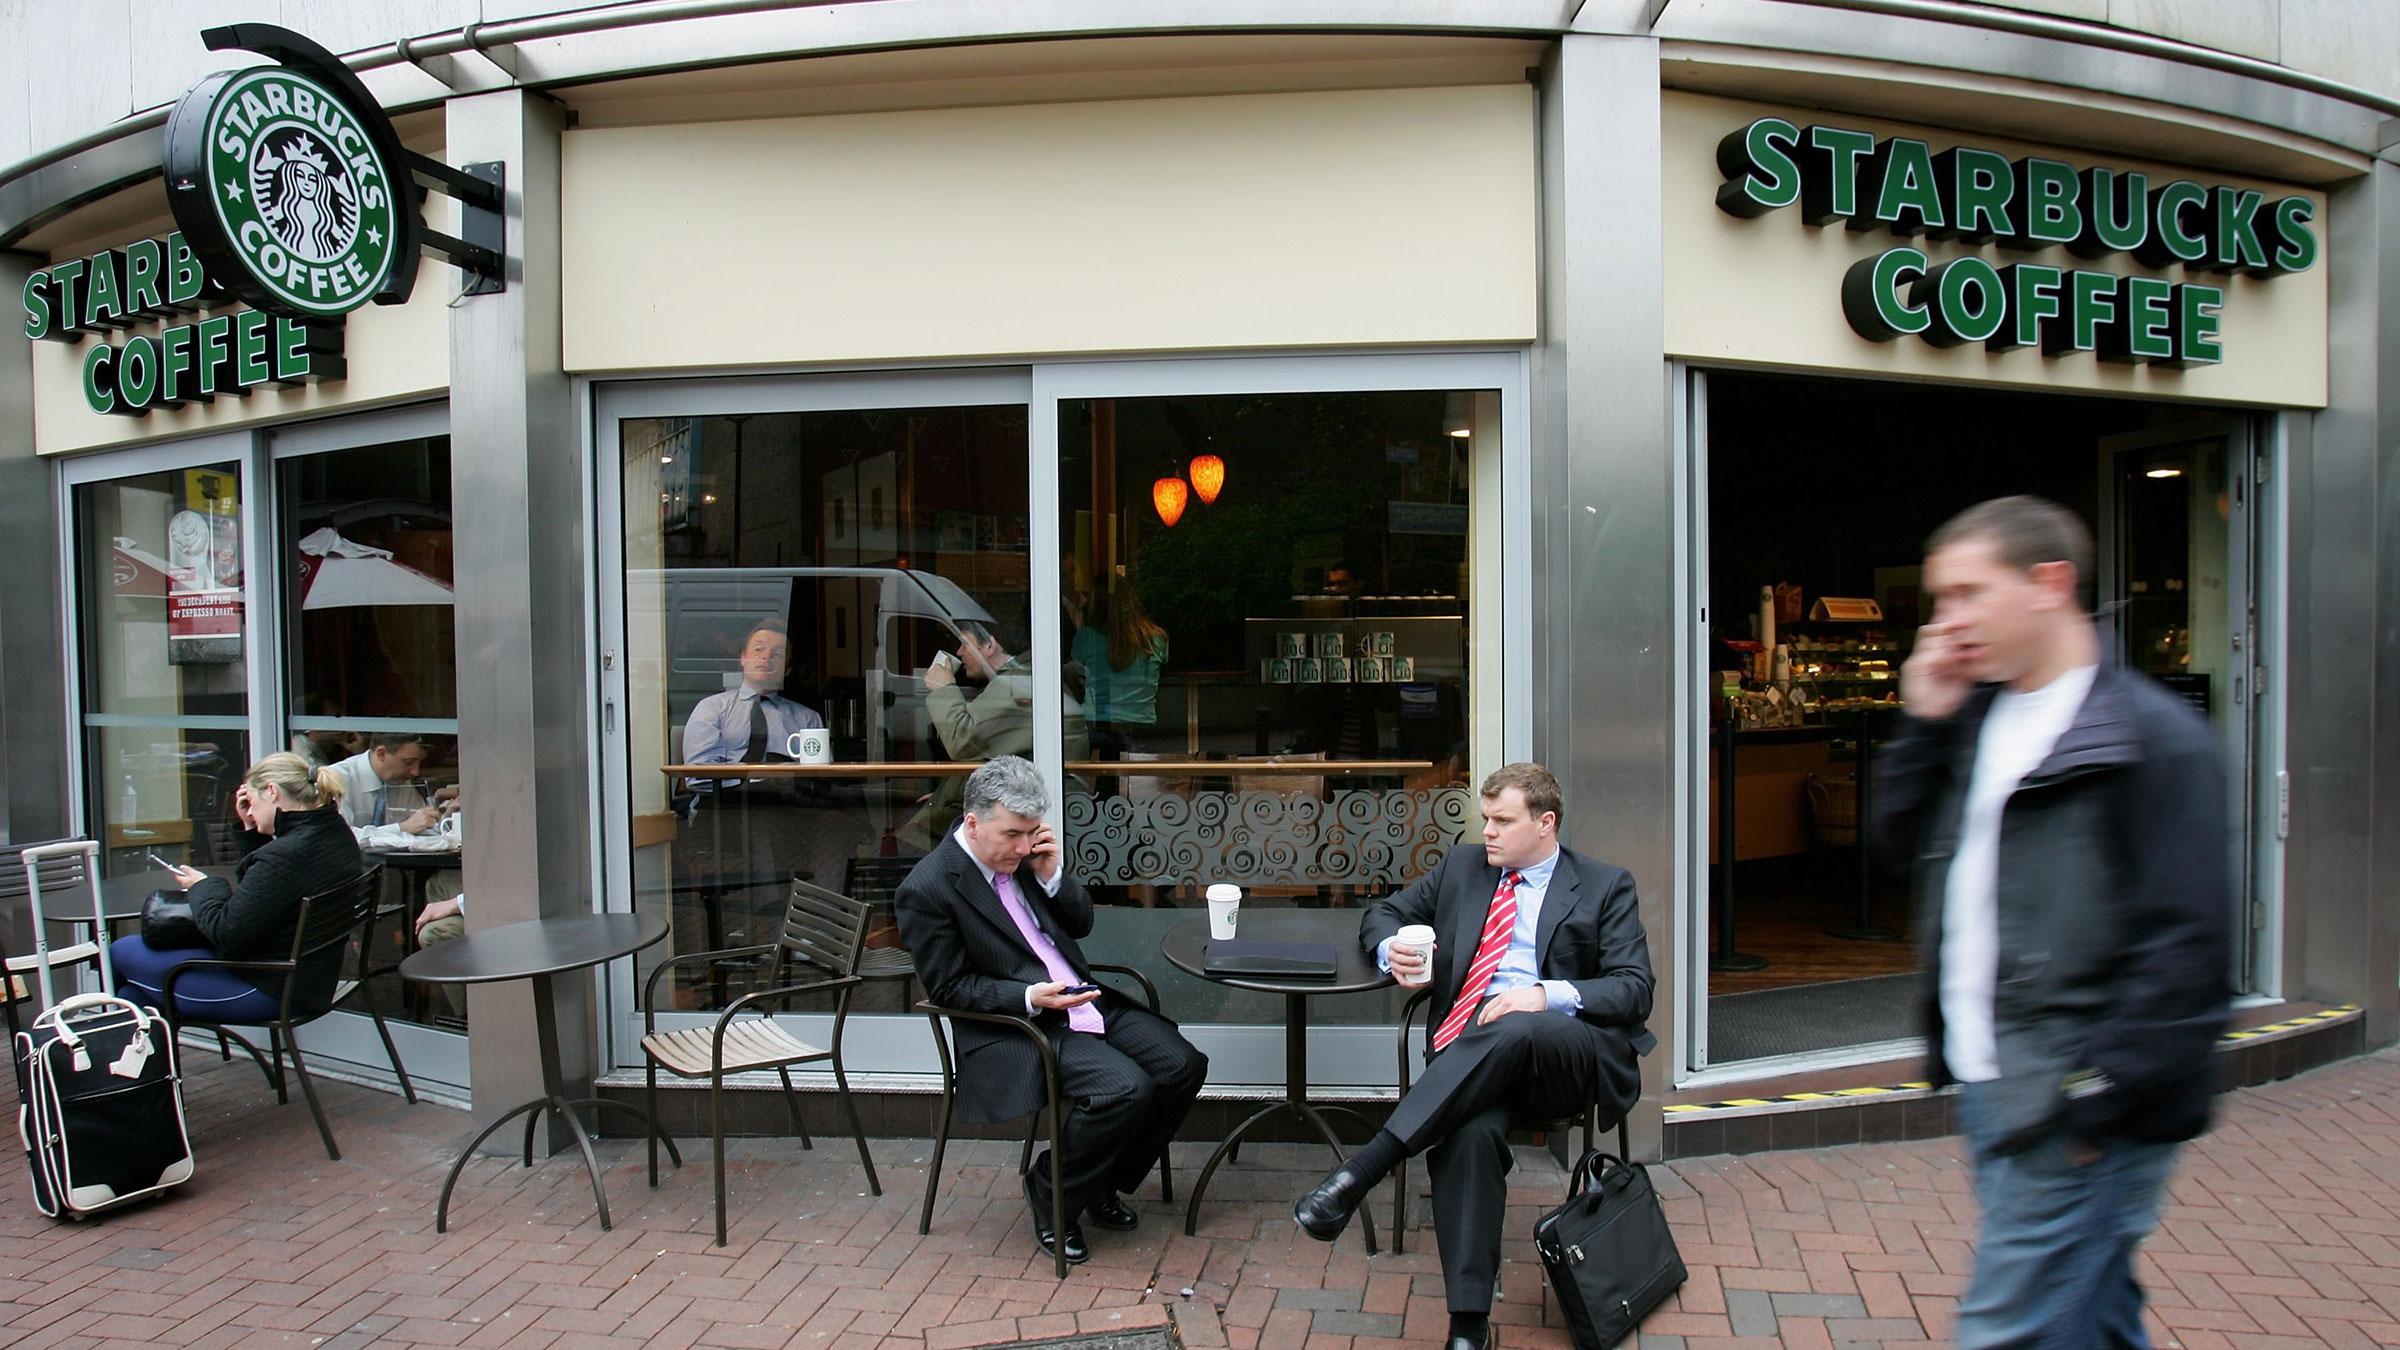 England Starbucks